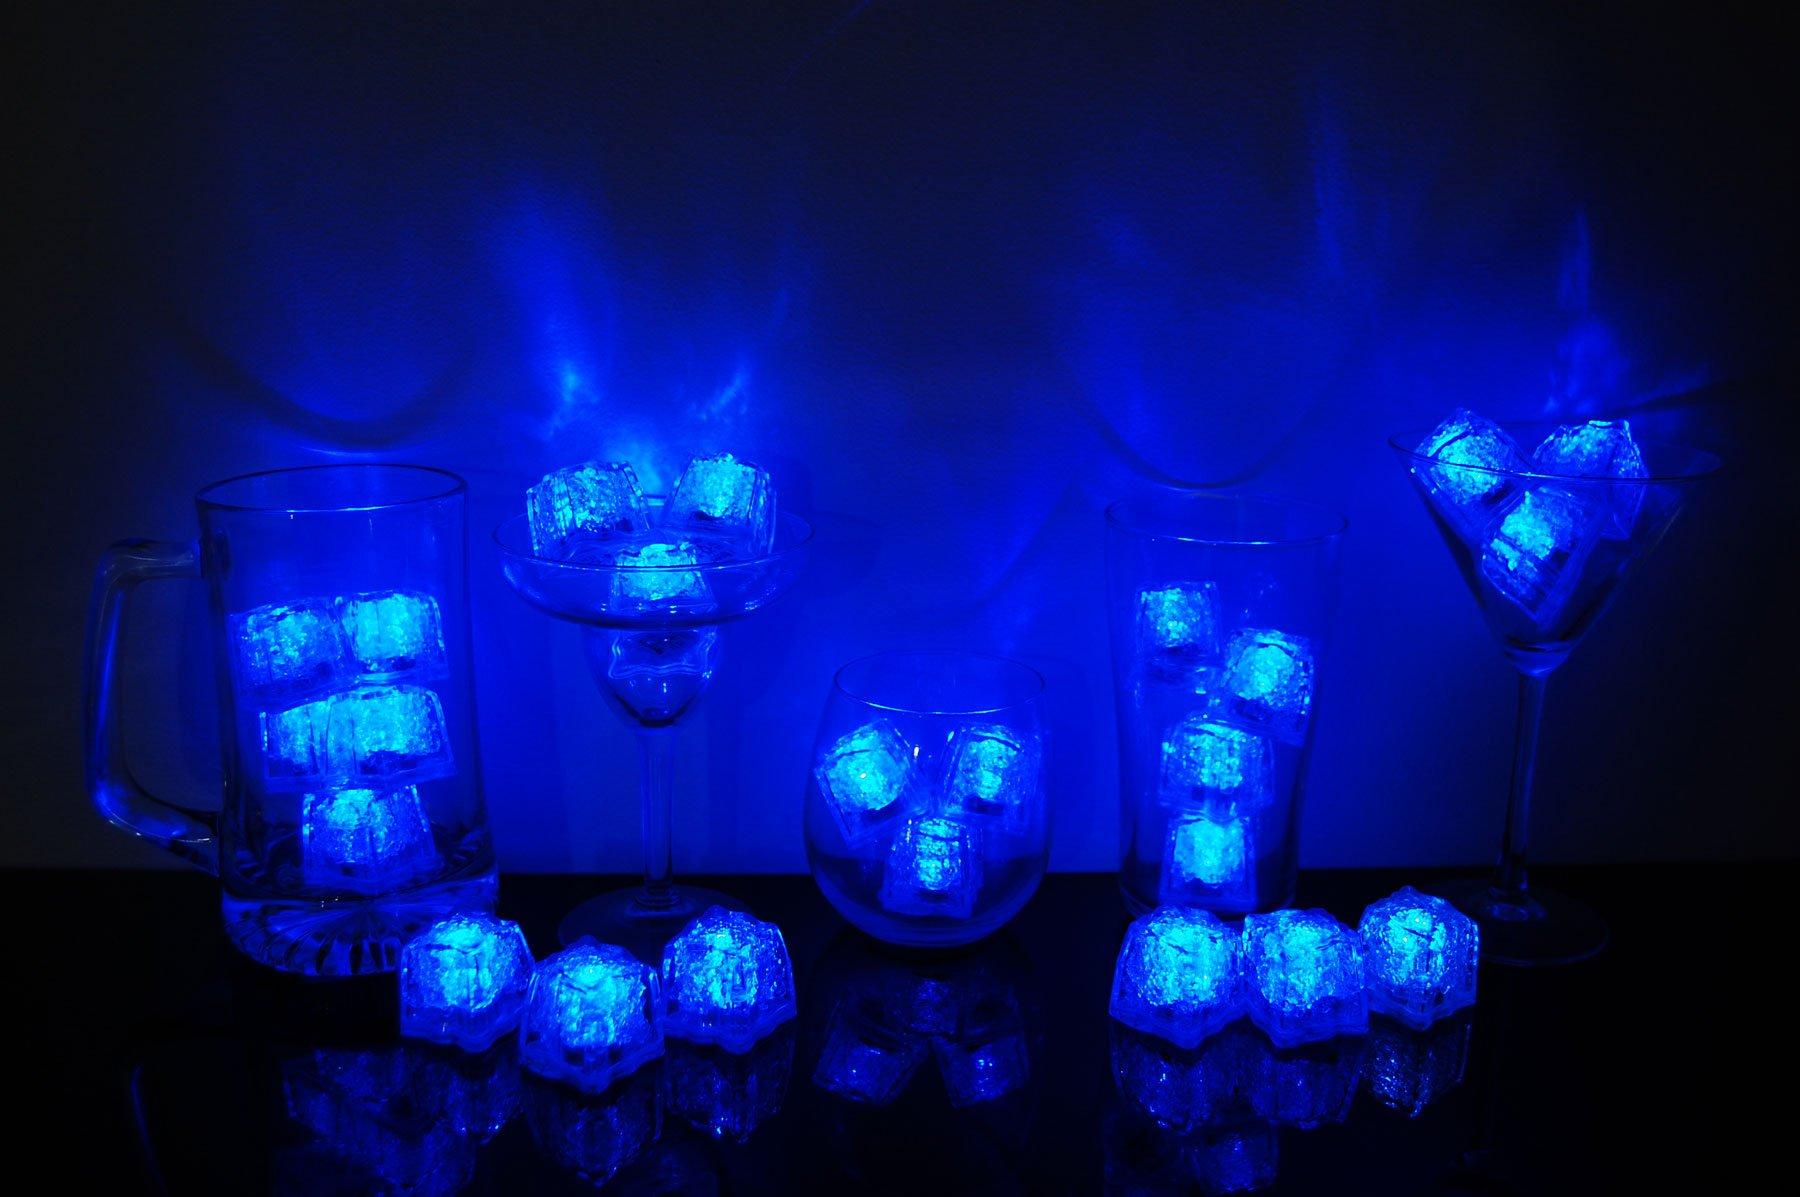 Litecubes Brand 3 Mode Blue Light up LED Ice Cubes (24)